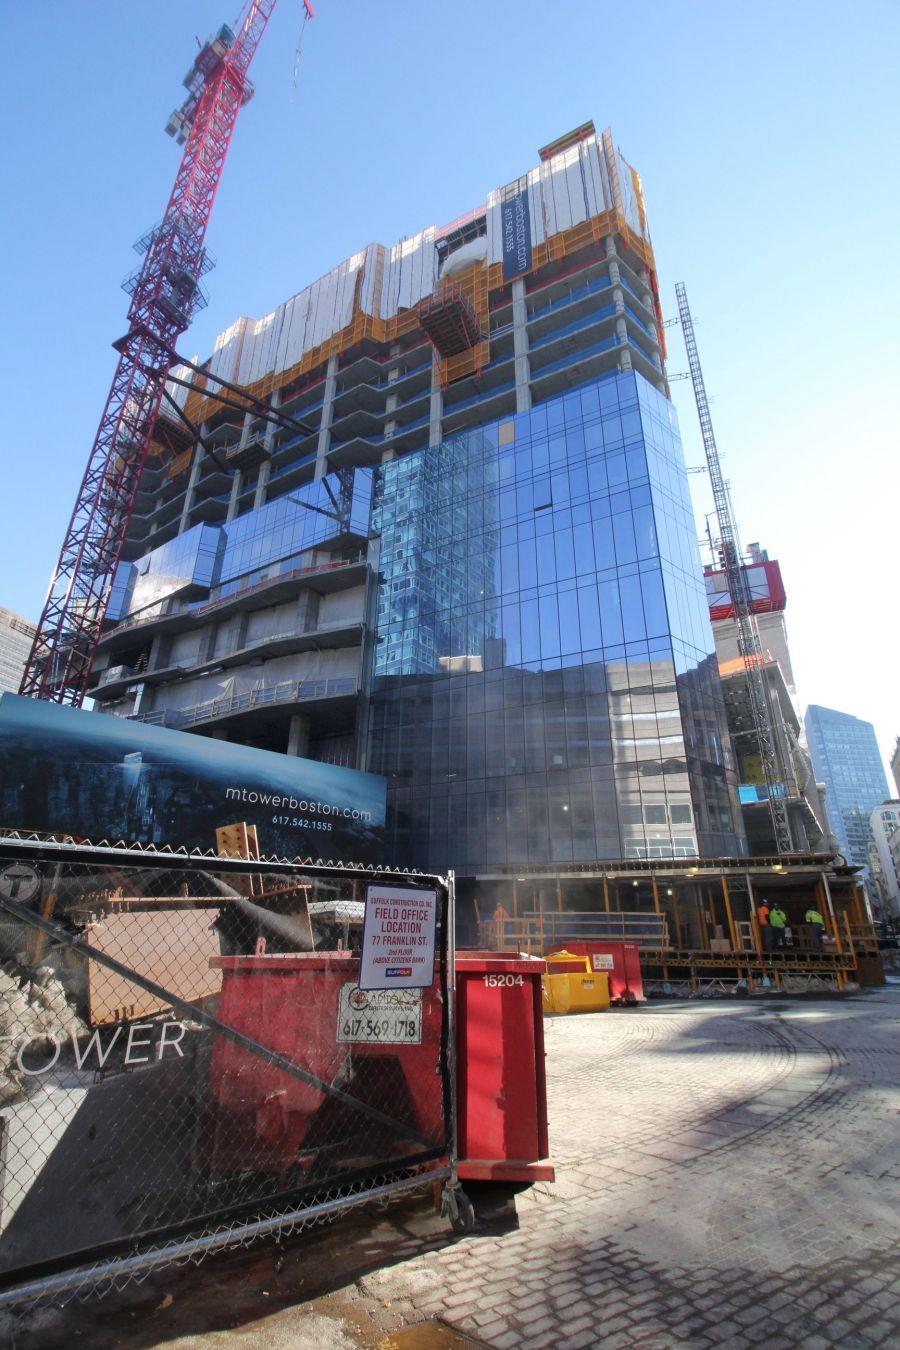 boston-millenium-tower-march-9-2015